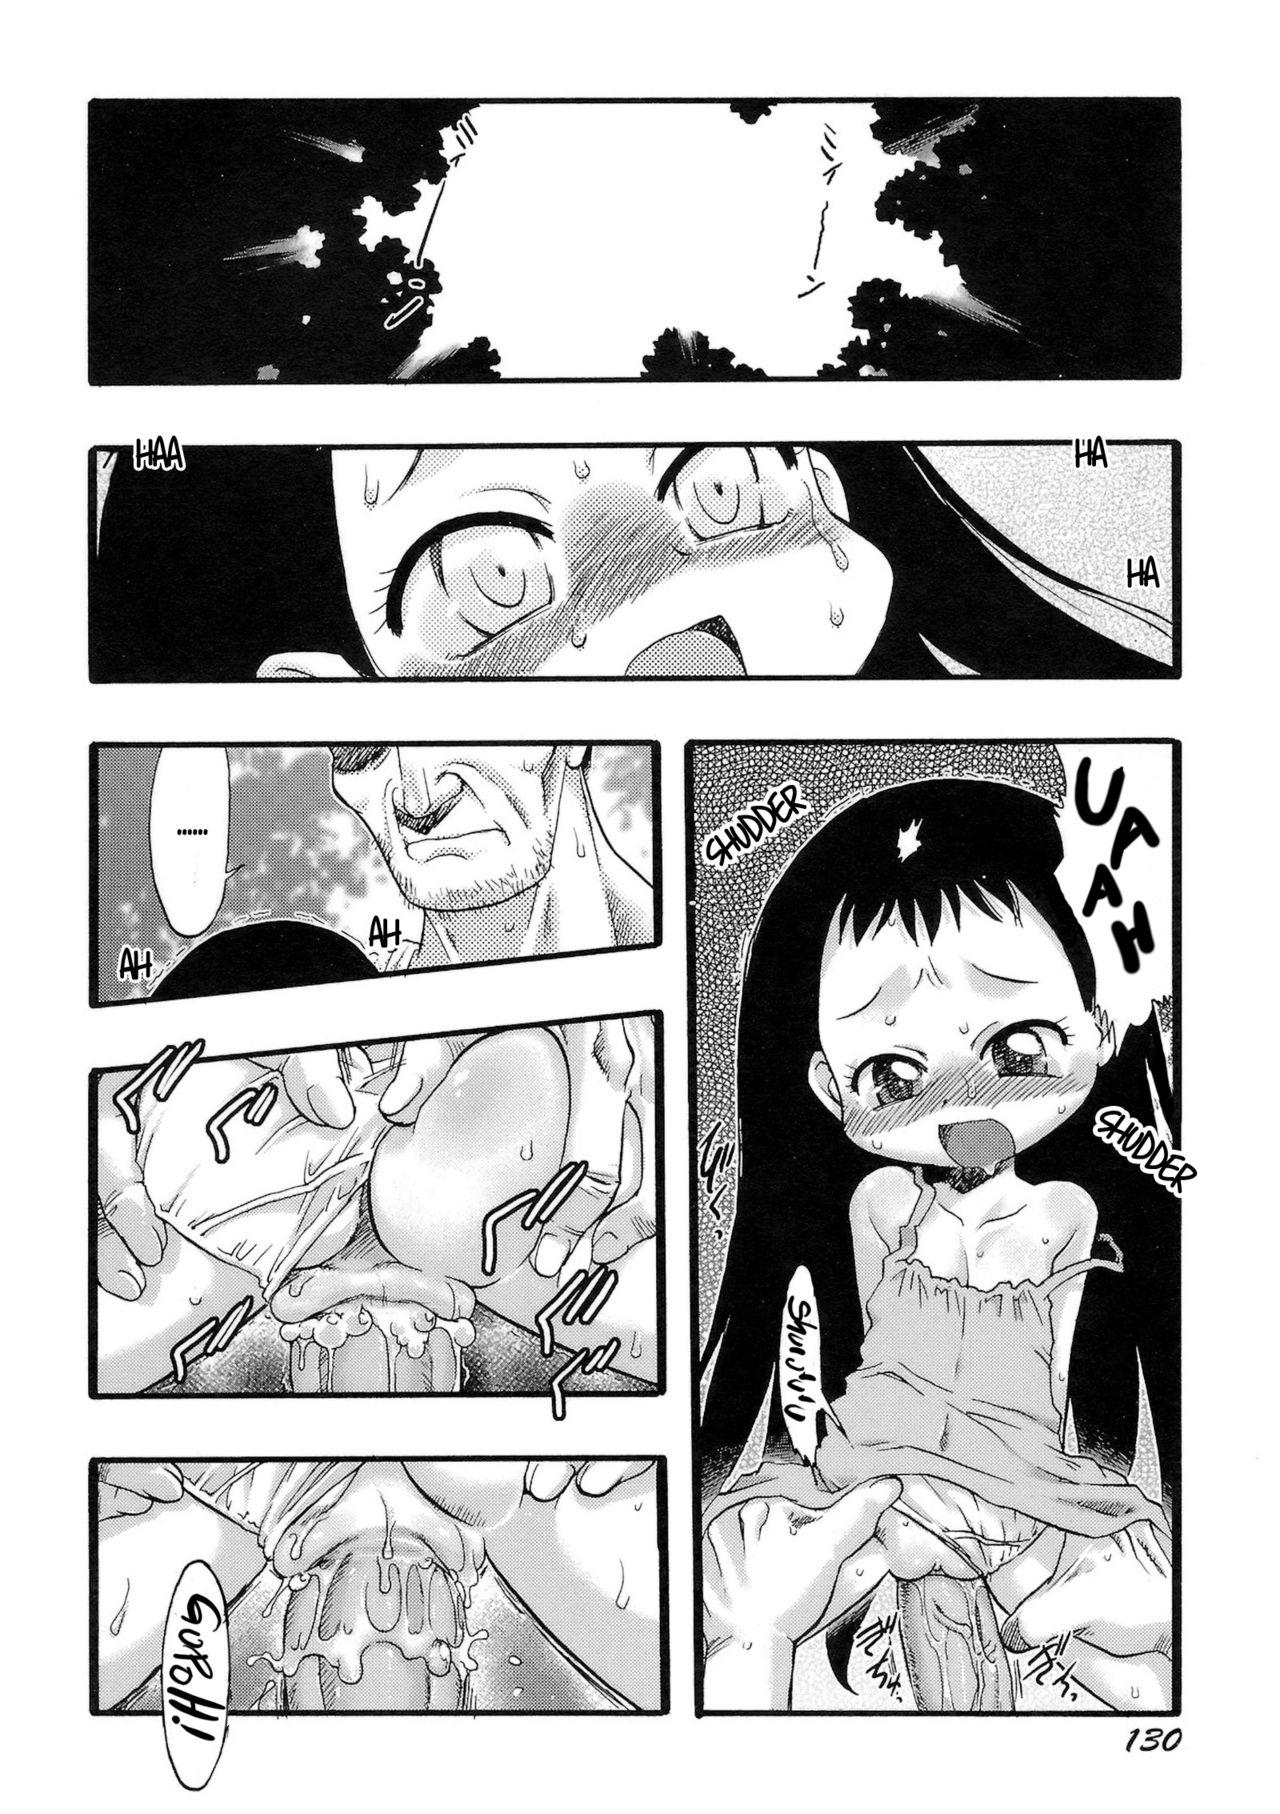 [Teruki Kuma] Osanaki Hana - Kami Haramishi Otome Ch. 1-5.5 [English] [Hige] 129